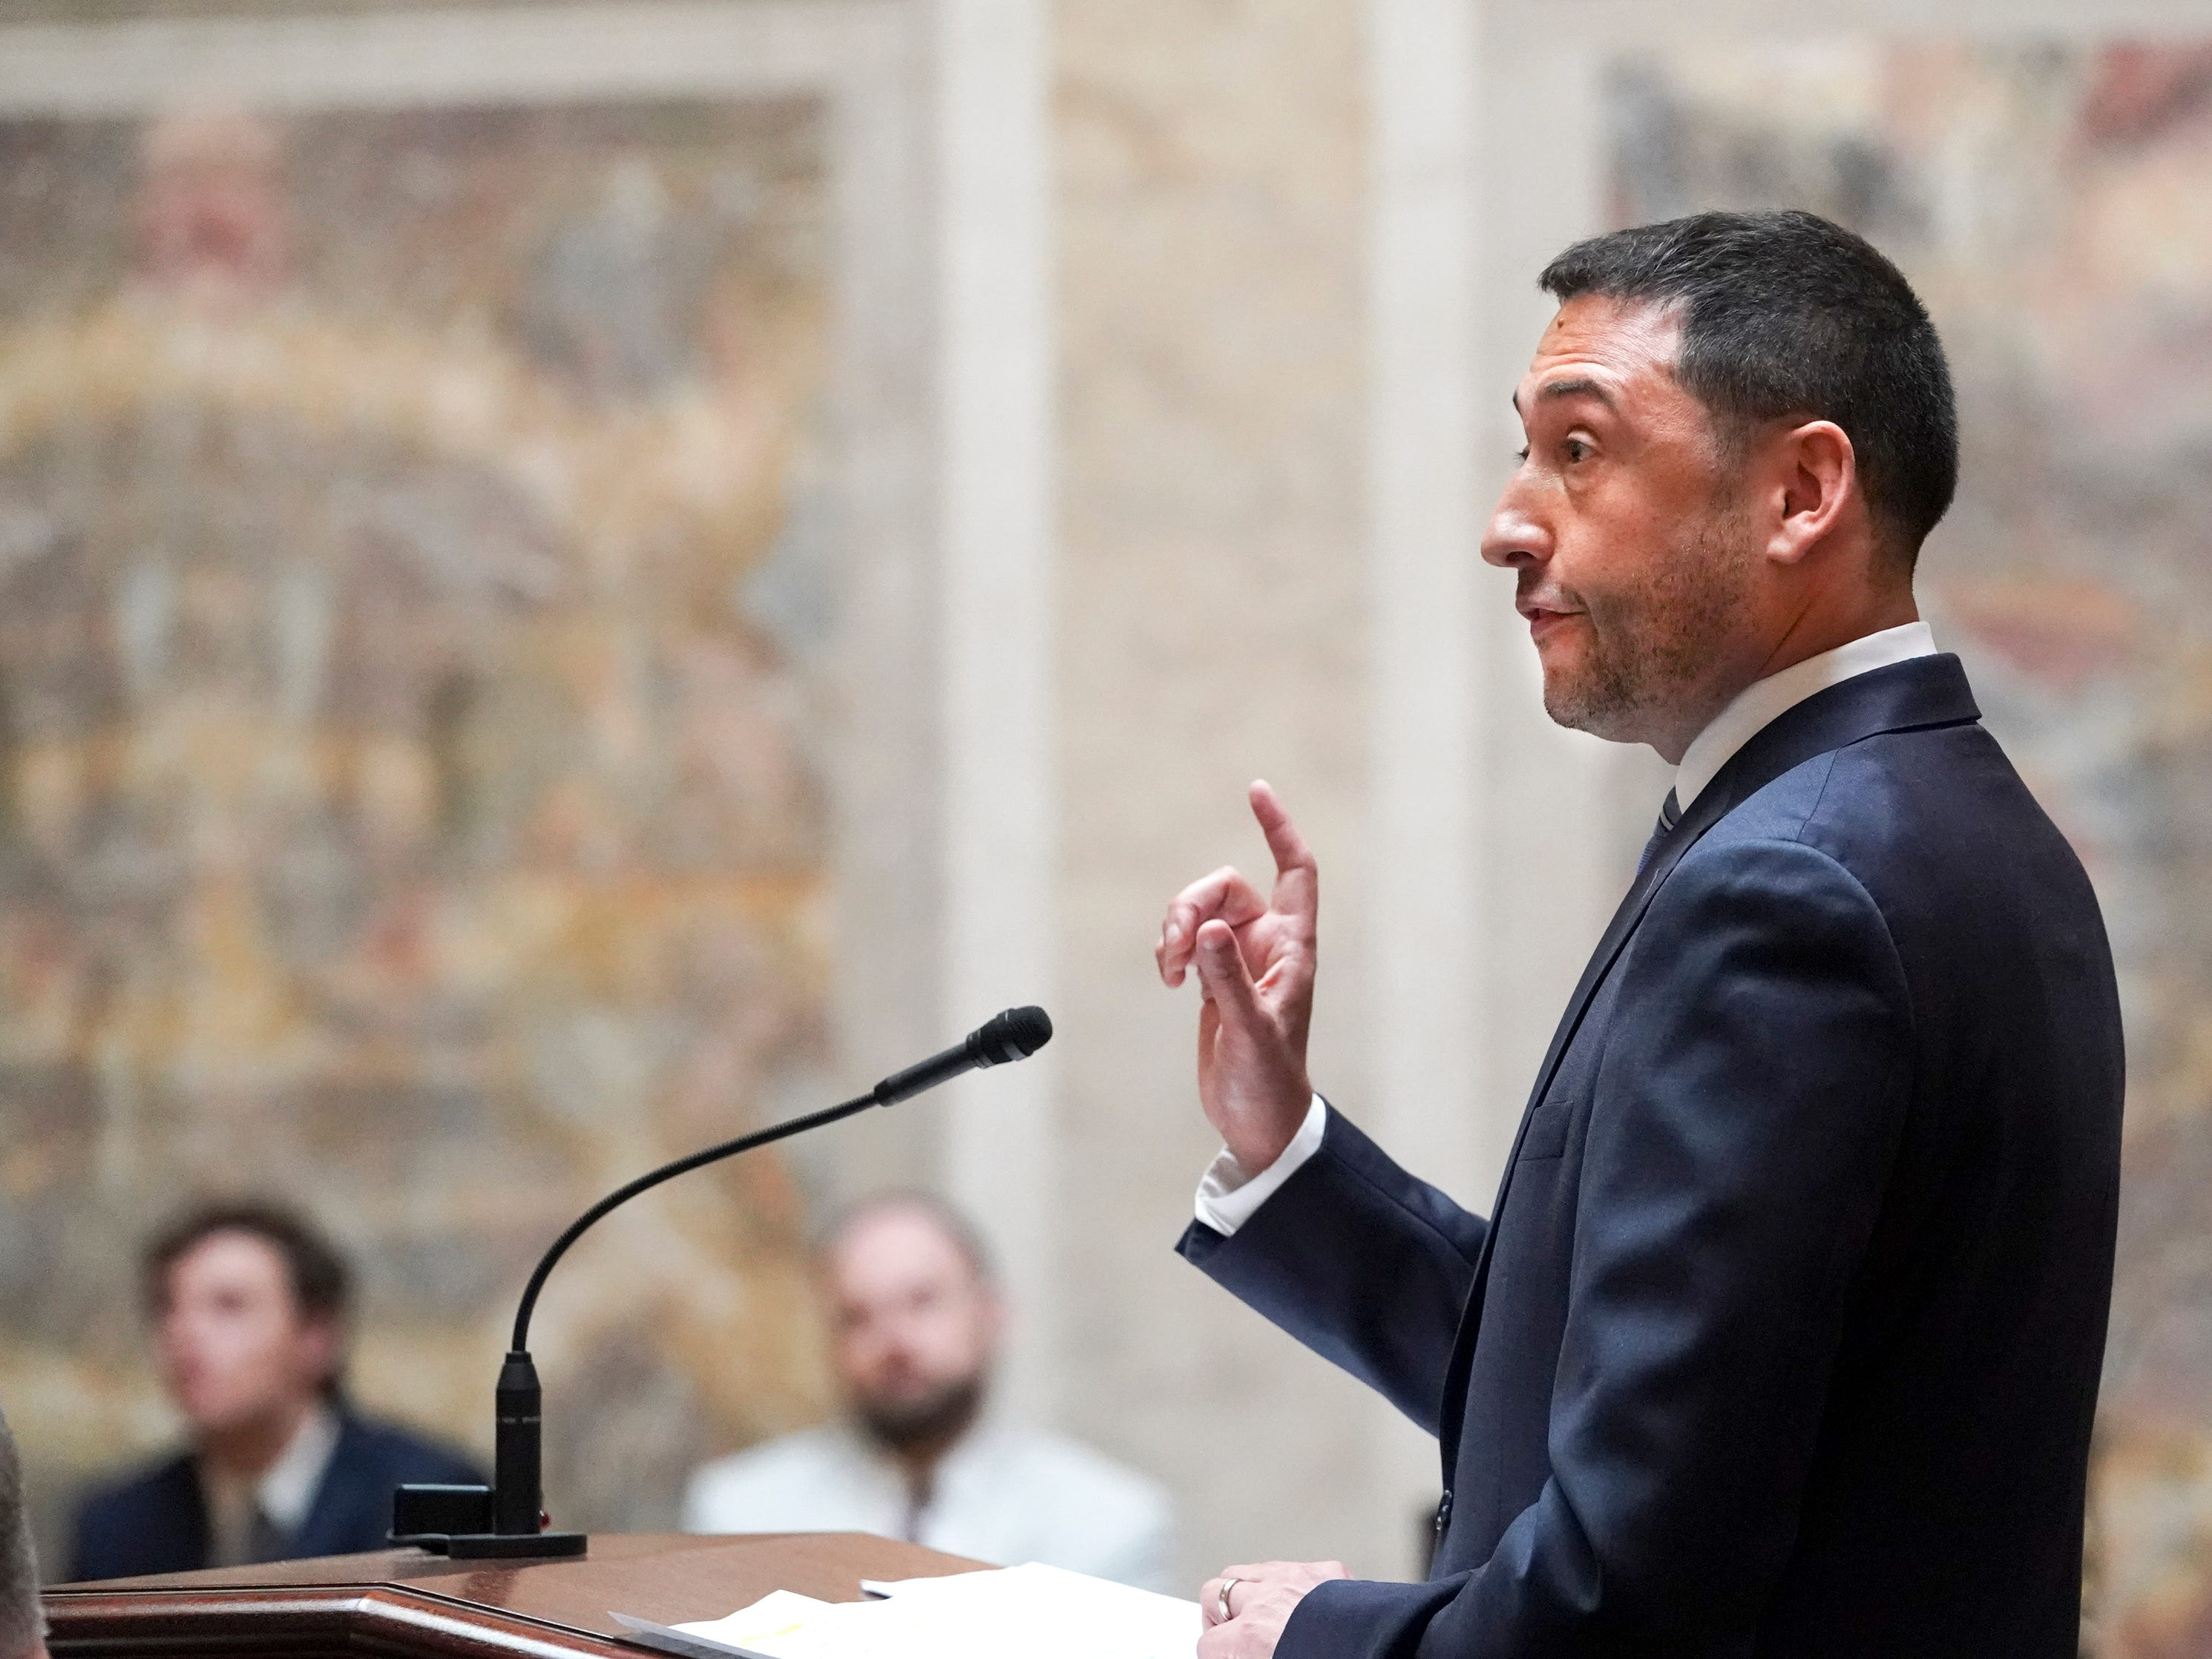 Republican legislators' attorney, Misha Tseytlin speaks during oral arguments.